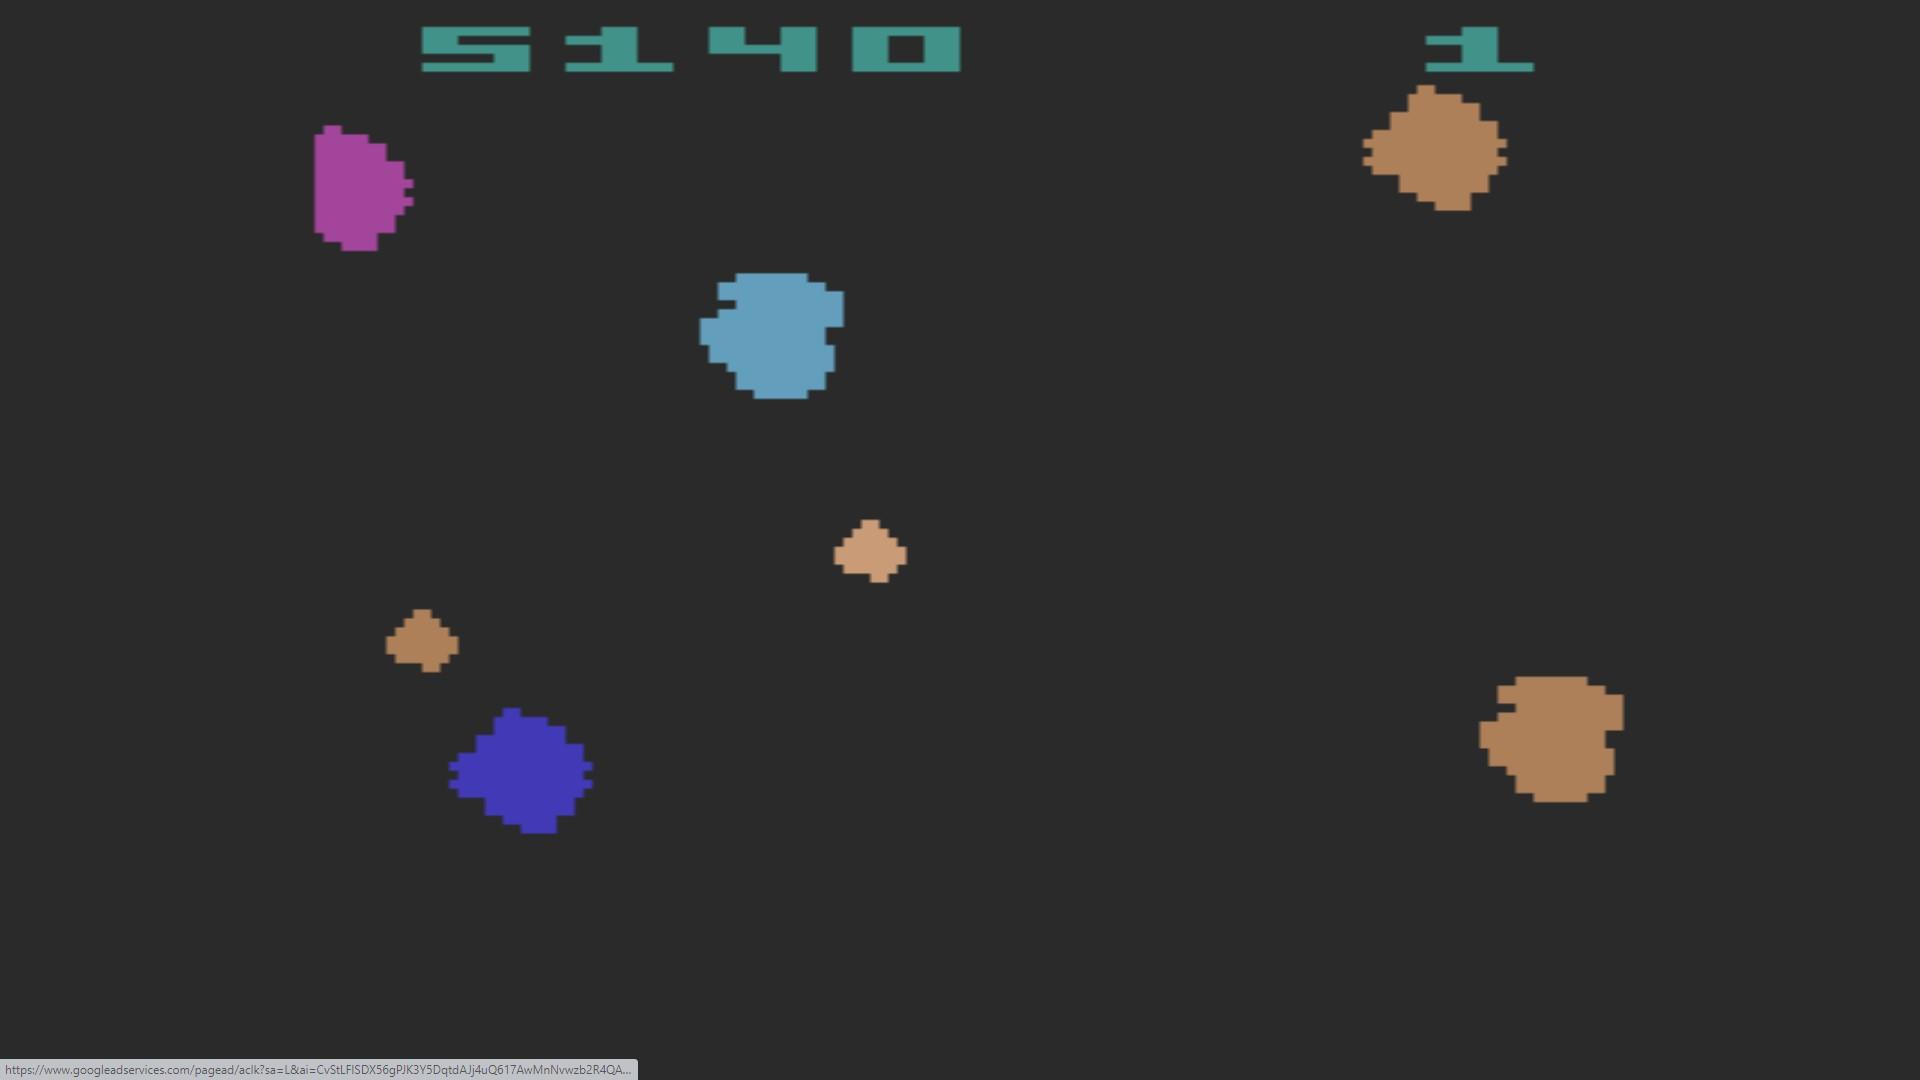 AkinNahtanoj: Asteroids: Game 3 (Atari 2600 Emulated Novice/B Mode) 5,140 points on 2020-10-11 13:57:08